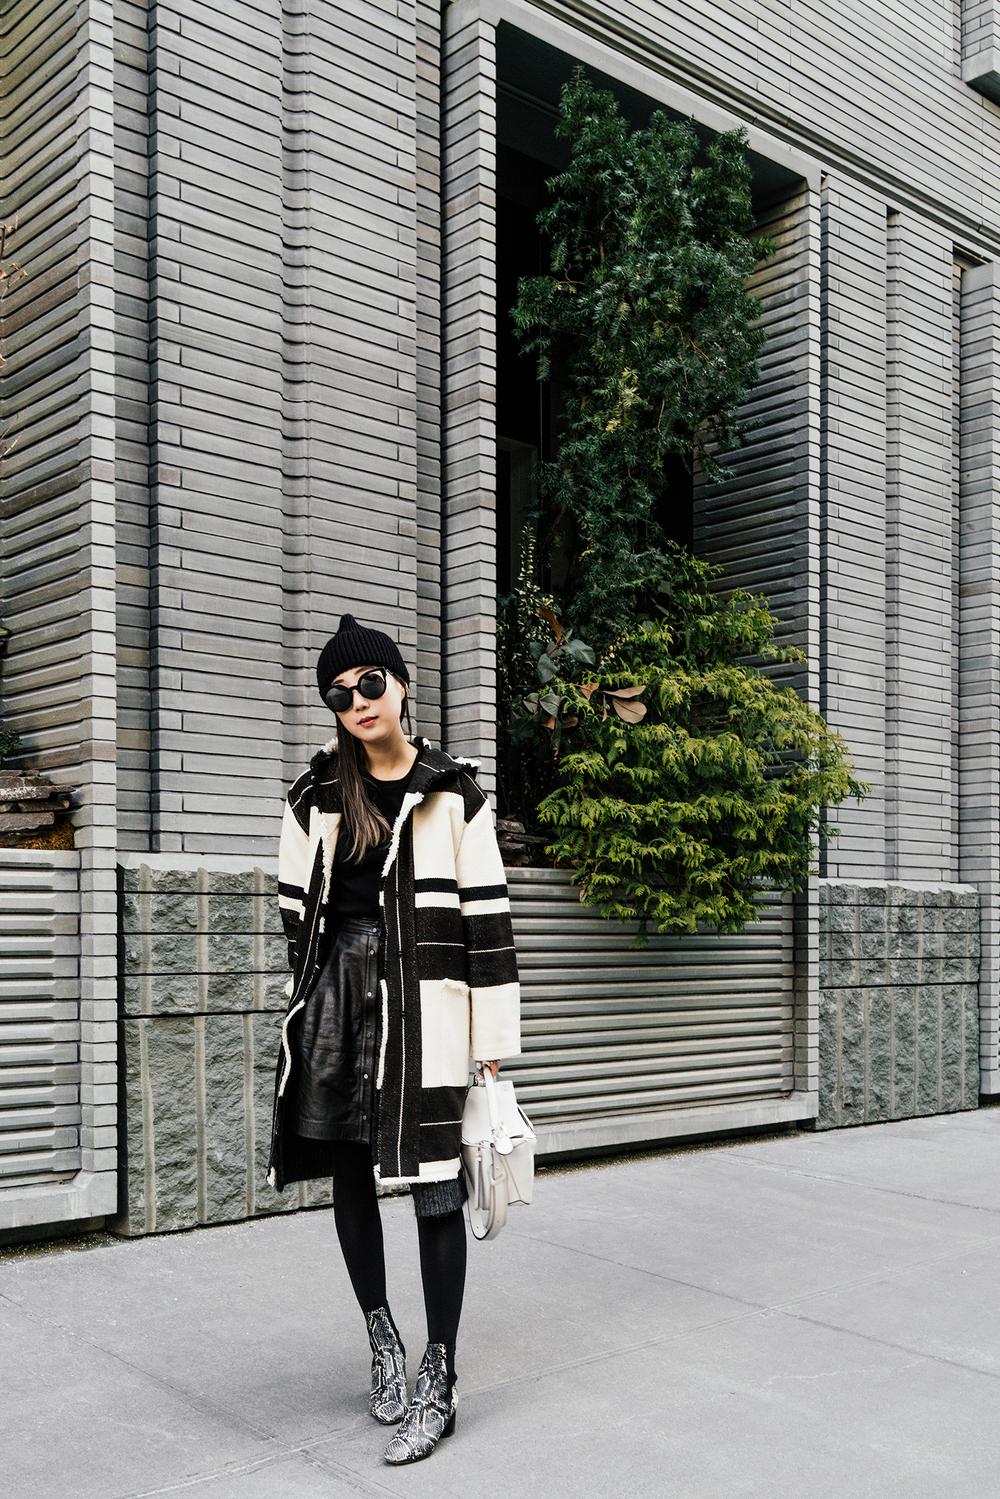 Isabel Marant Coat and Shoes, Everlane Sweater, Vince Skirt, Loewe Bag, Fendi Sunglasses